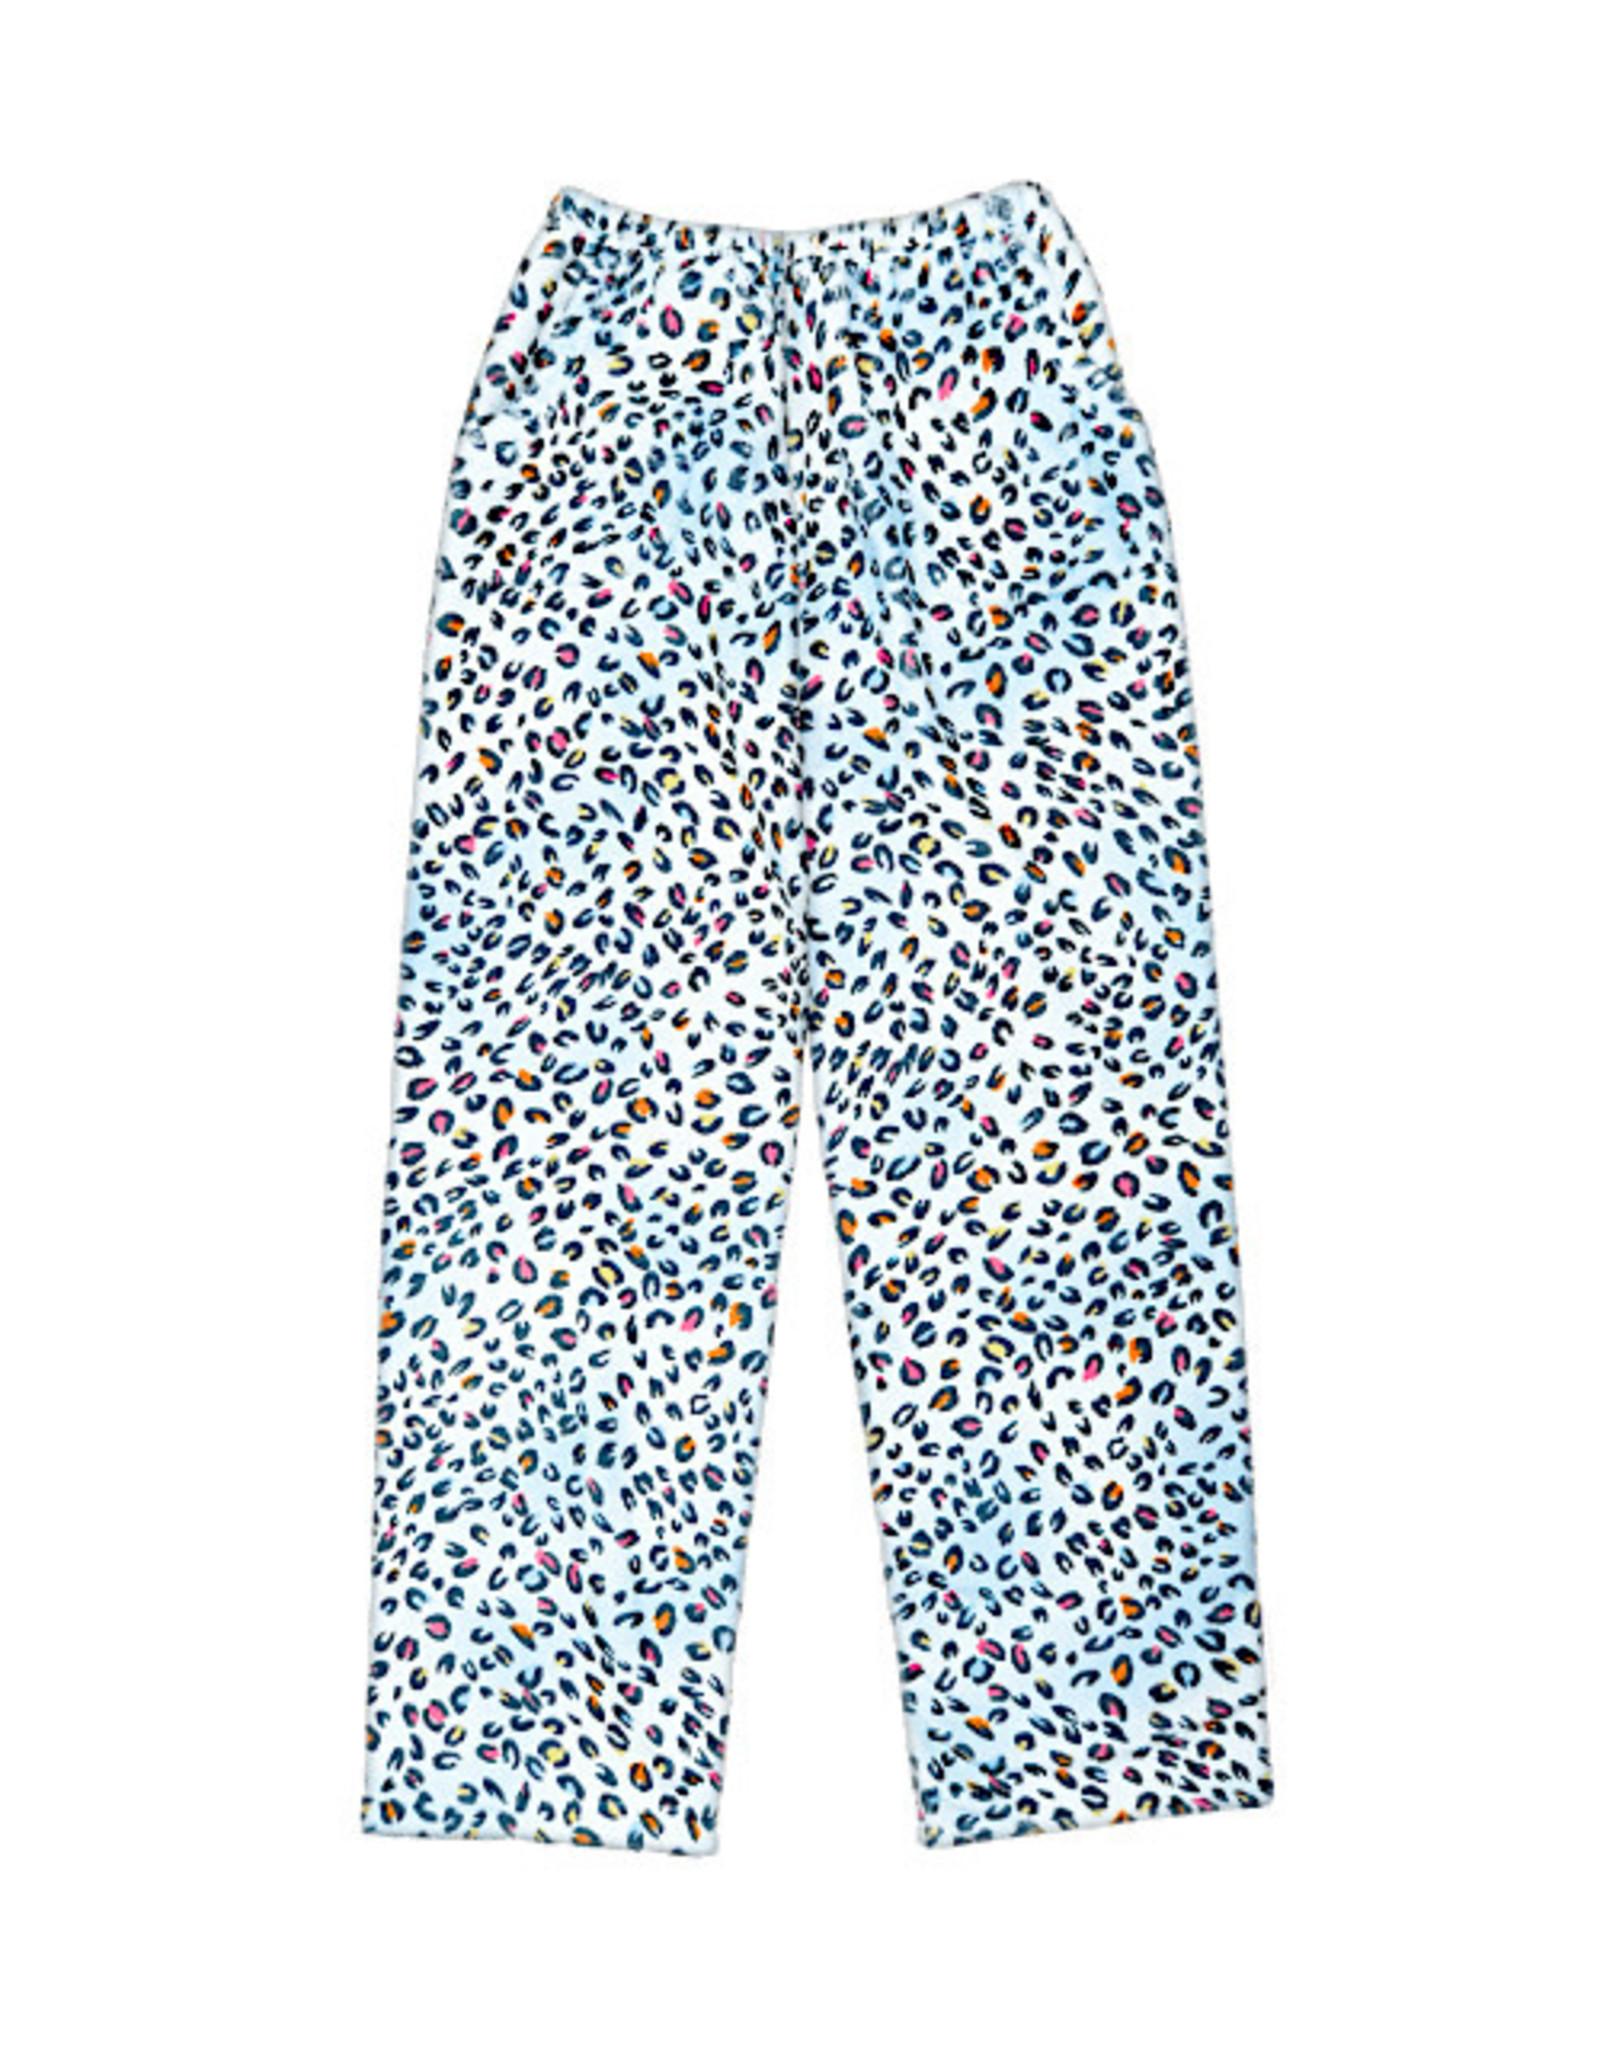 Iscream Pastel Leopard  Plush Pants